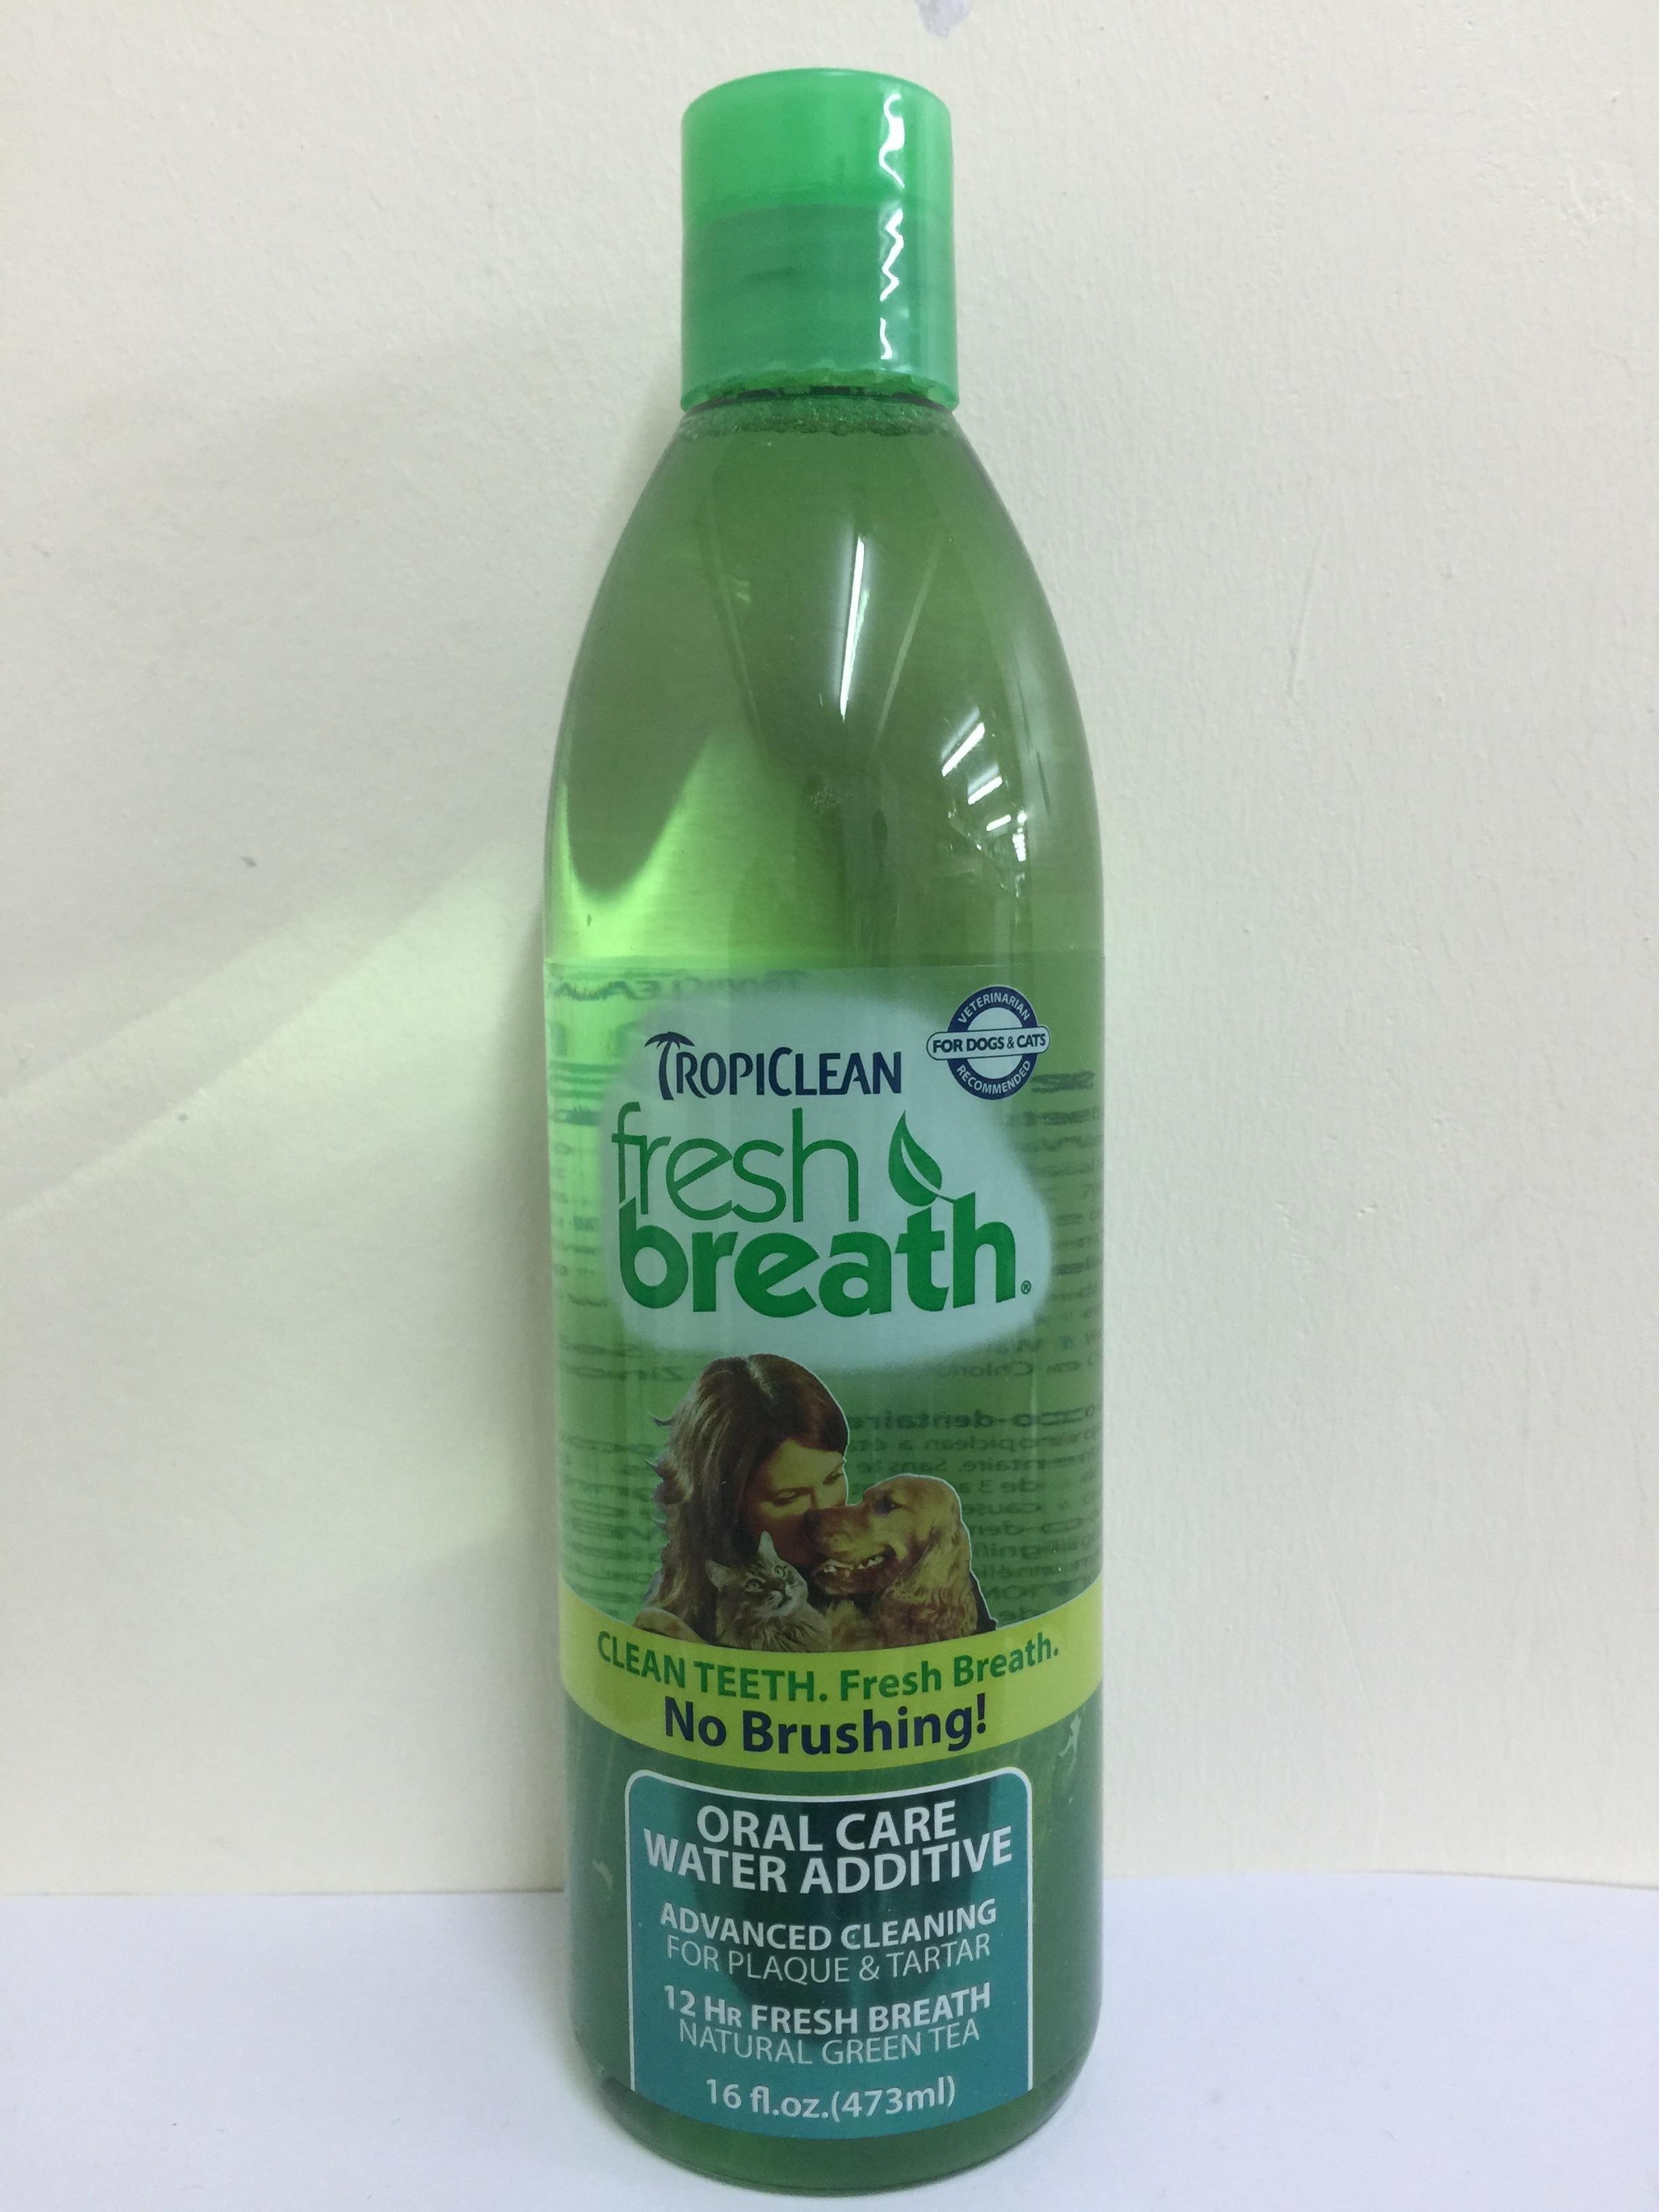 Tropiclean fresh breath Water Additive ผลิตภัณฑ์ผสมน้ำลดกลิ่นปาก 16 fl oz